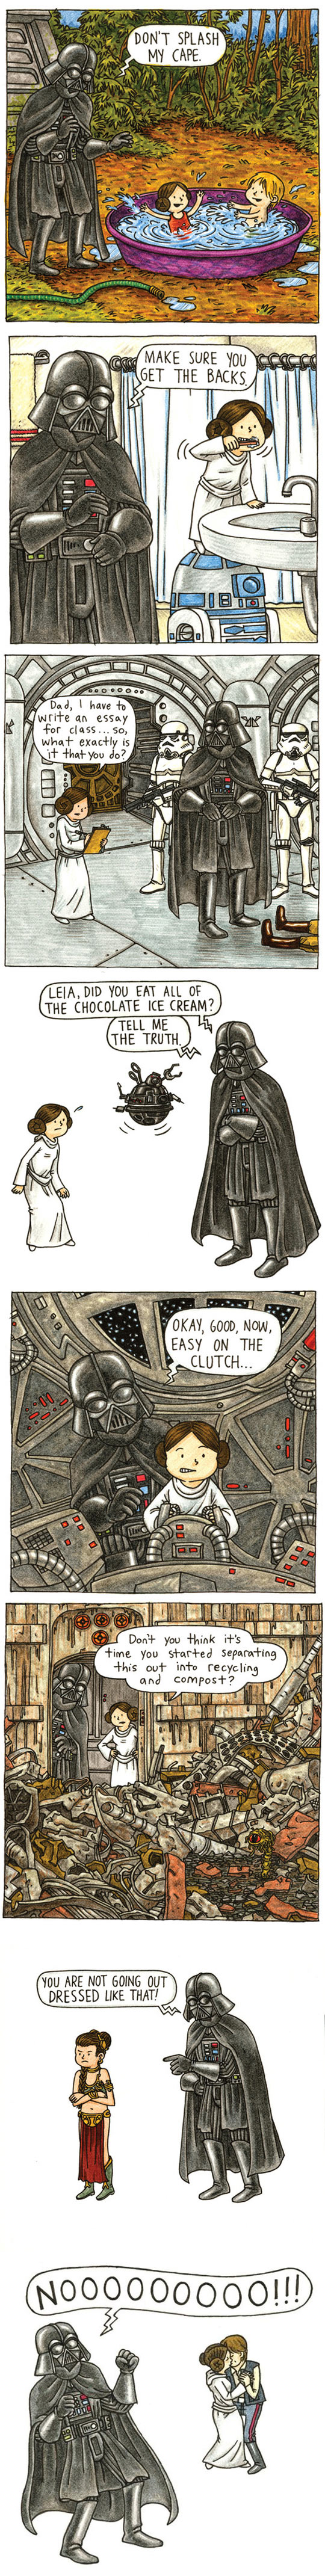 funny-Darth-Vader-father-adventure